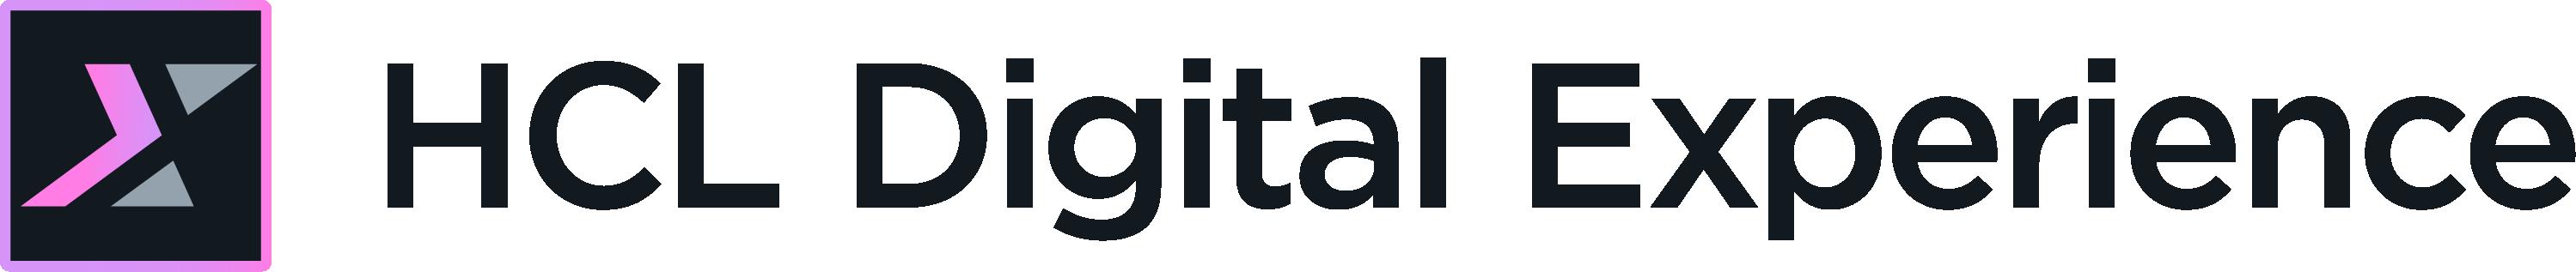 HCL Digital Experience logo